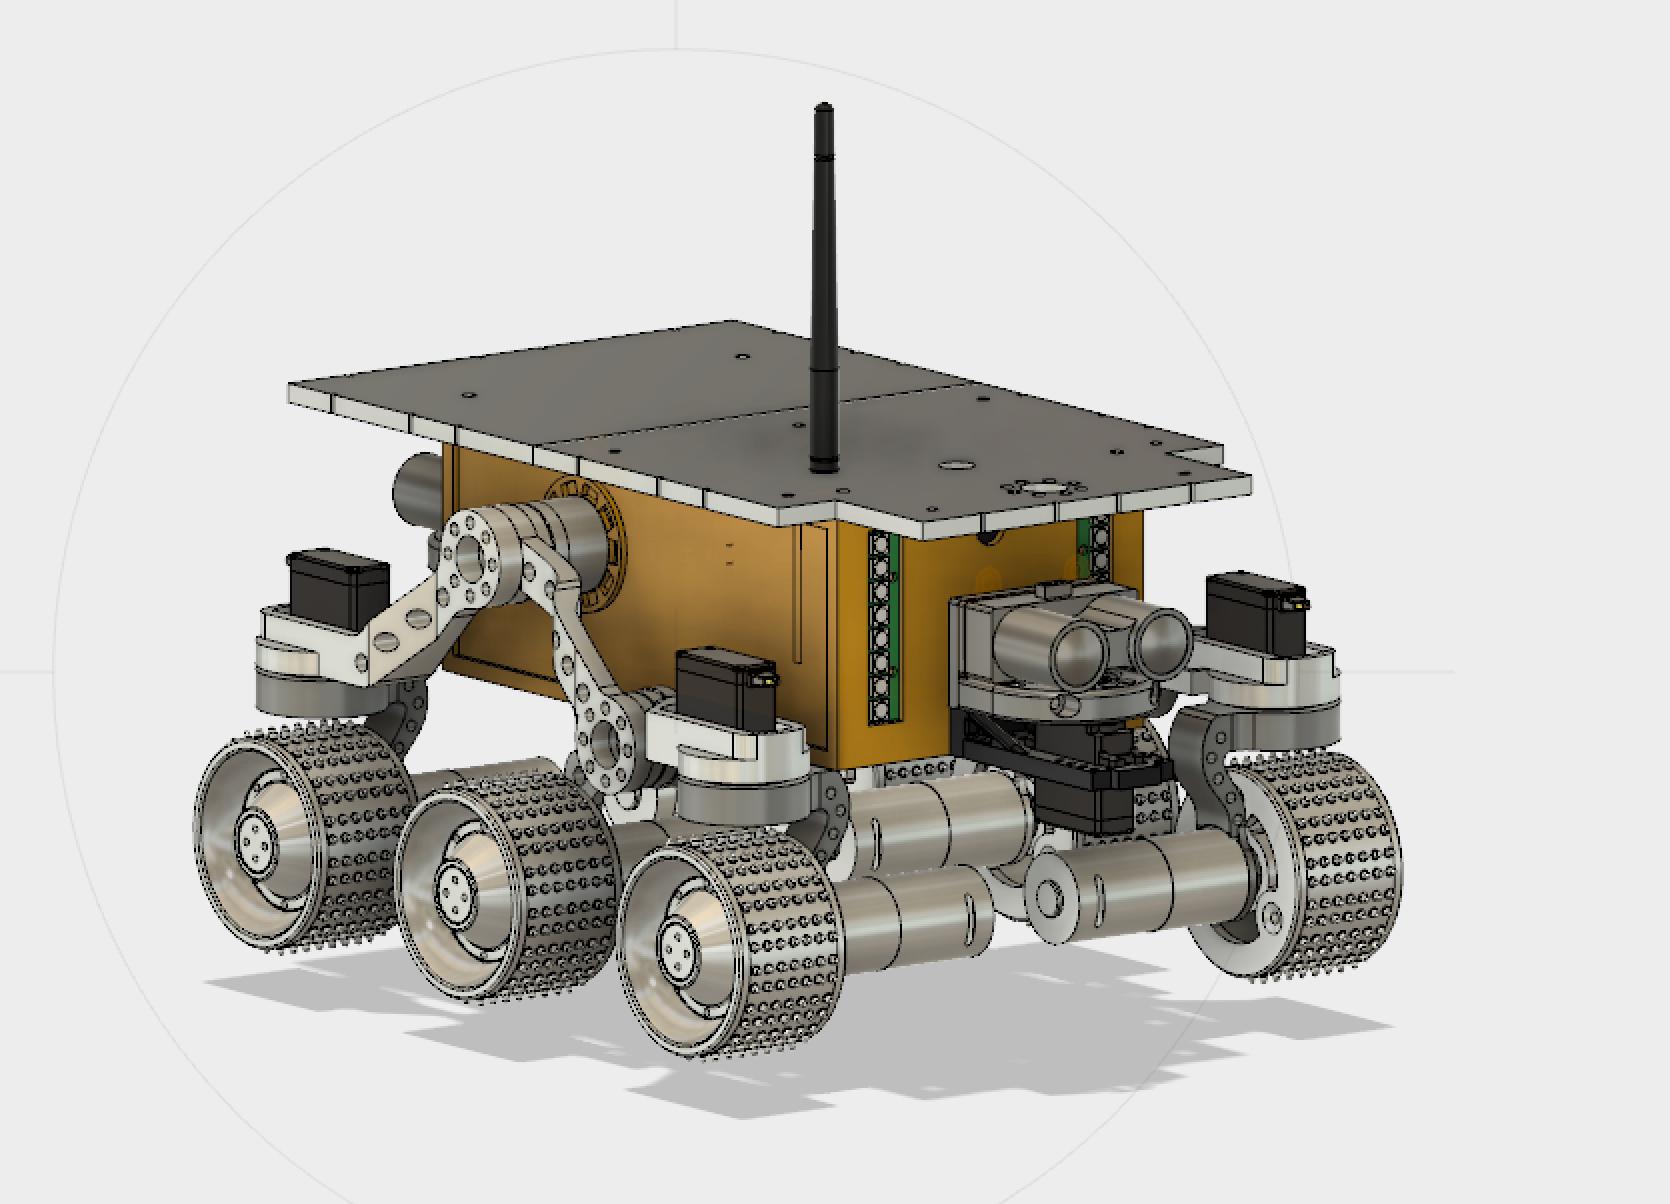 mars rover sojourner - photo #21